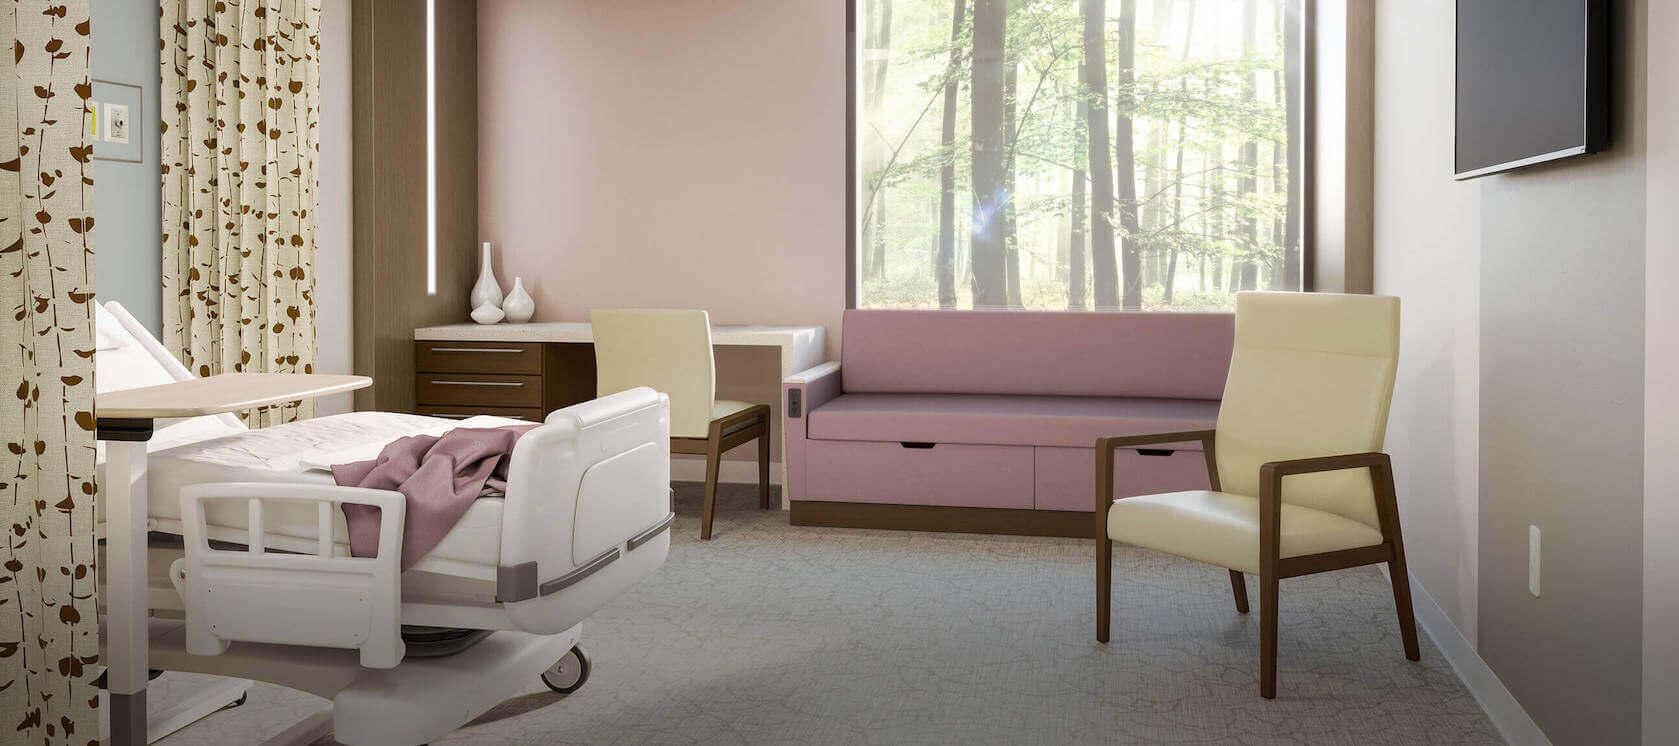 GetWell Patient Room